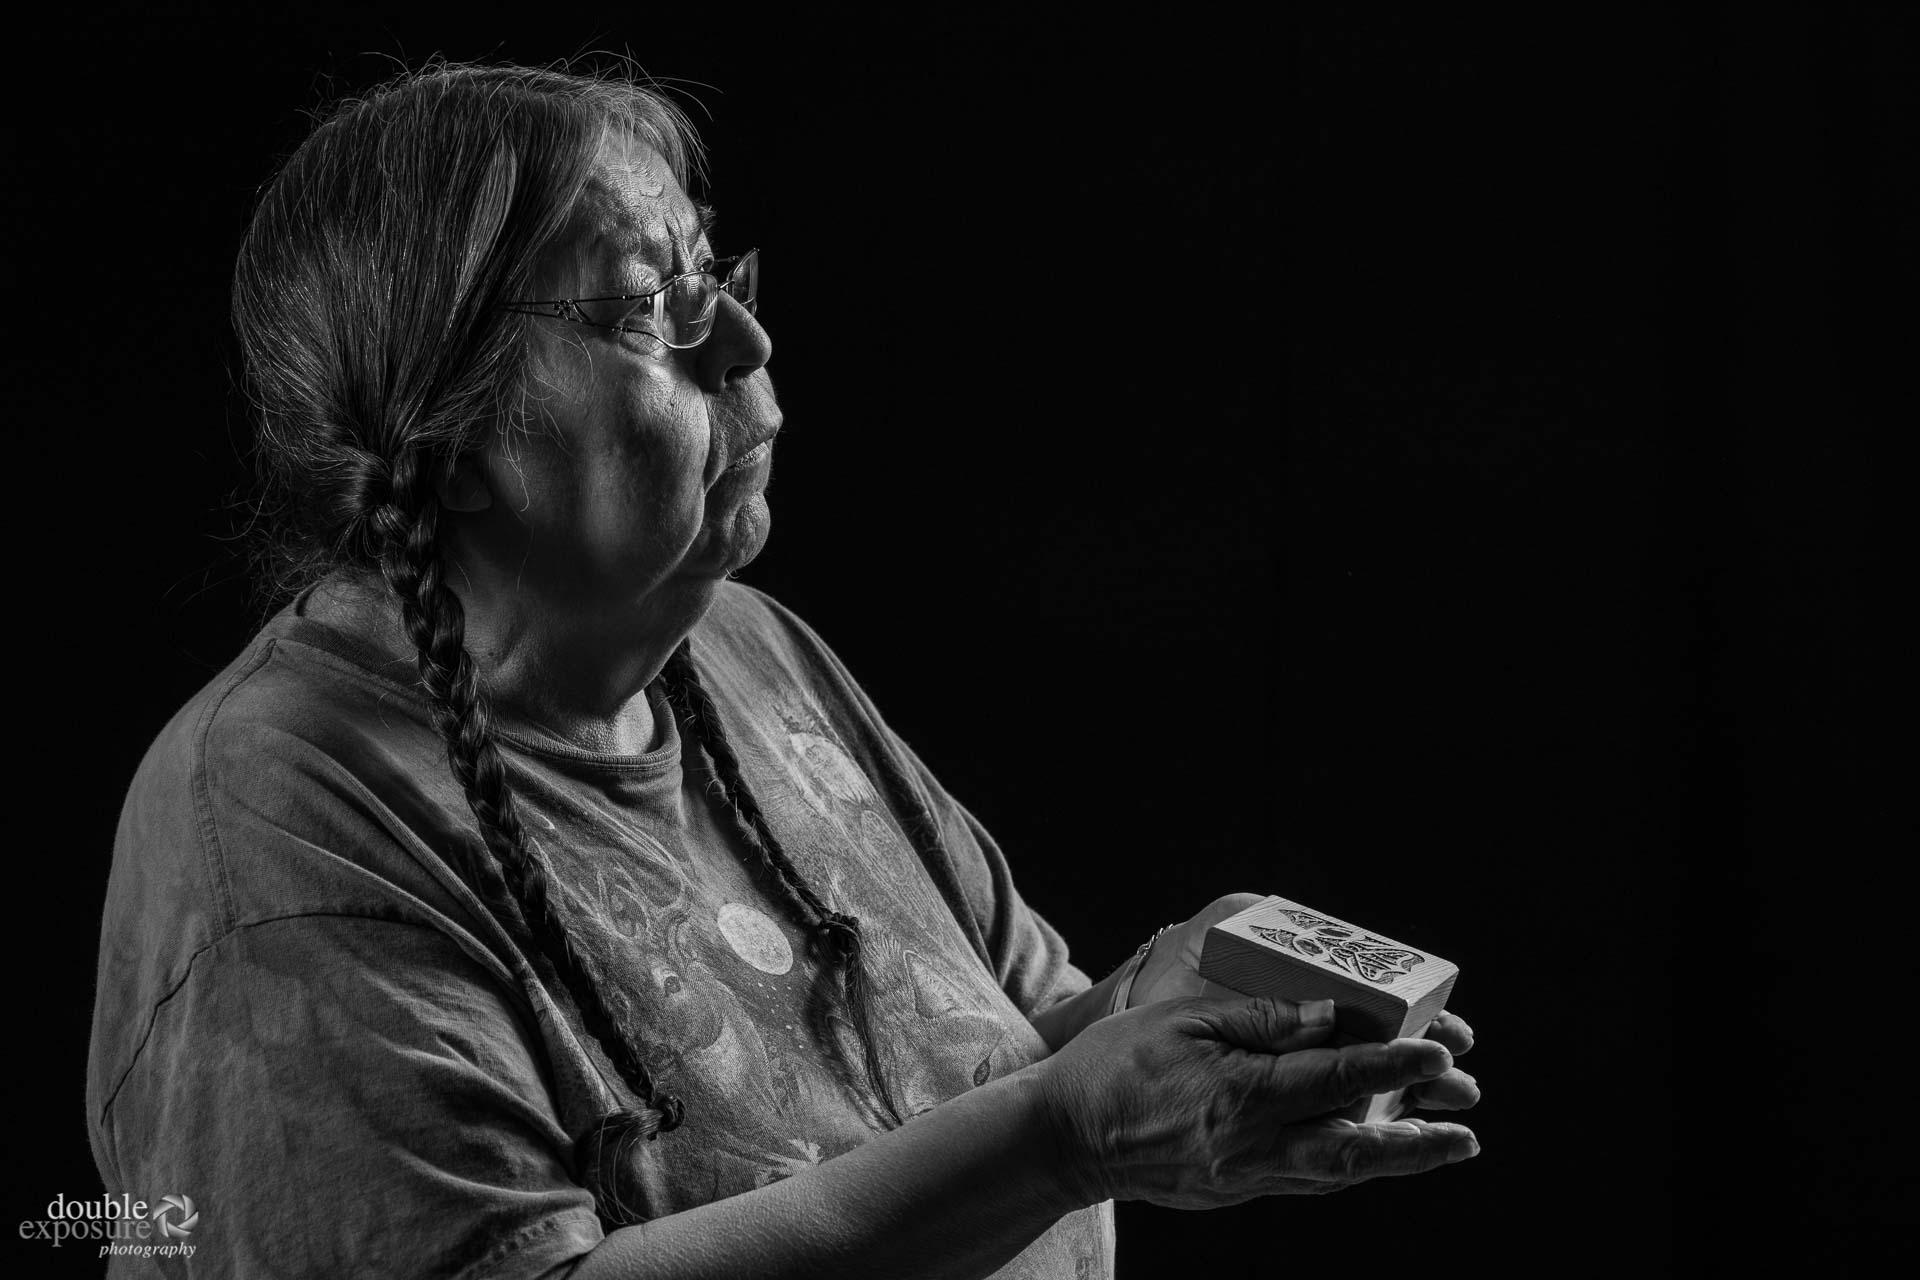 teacher of aboriginal culture